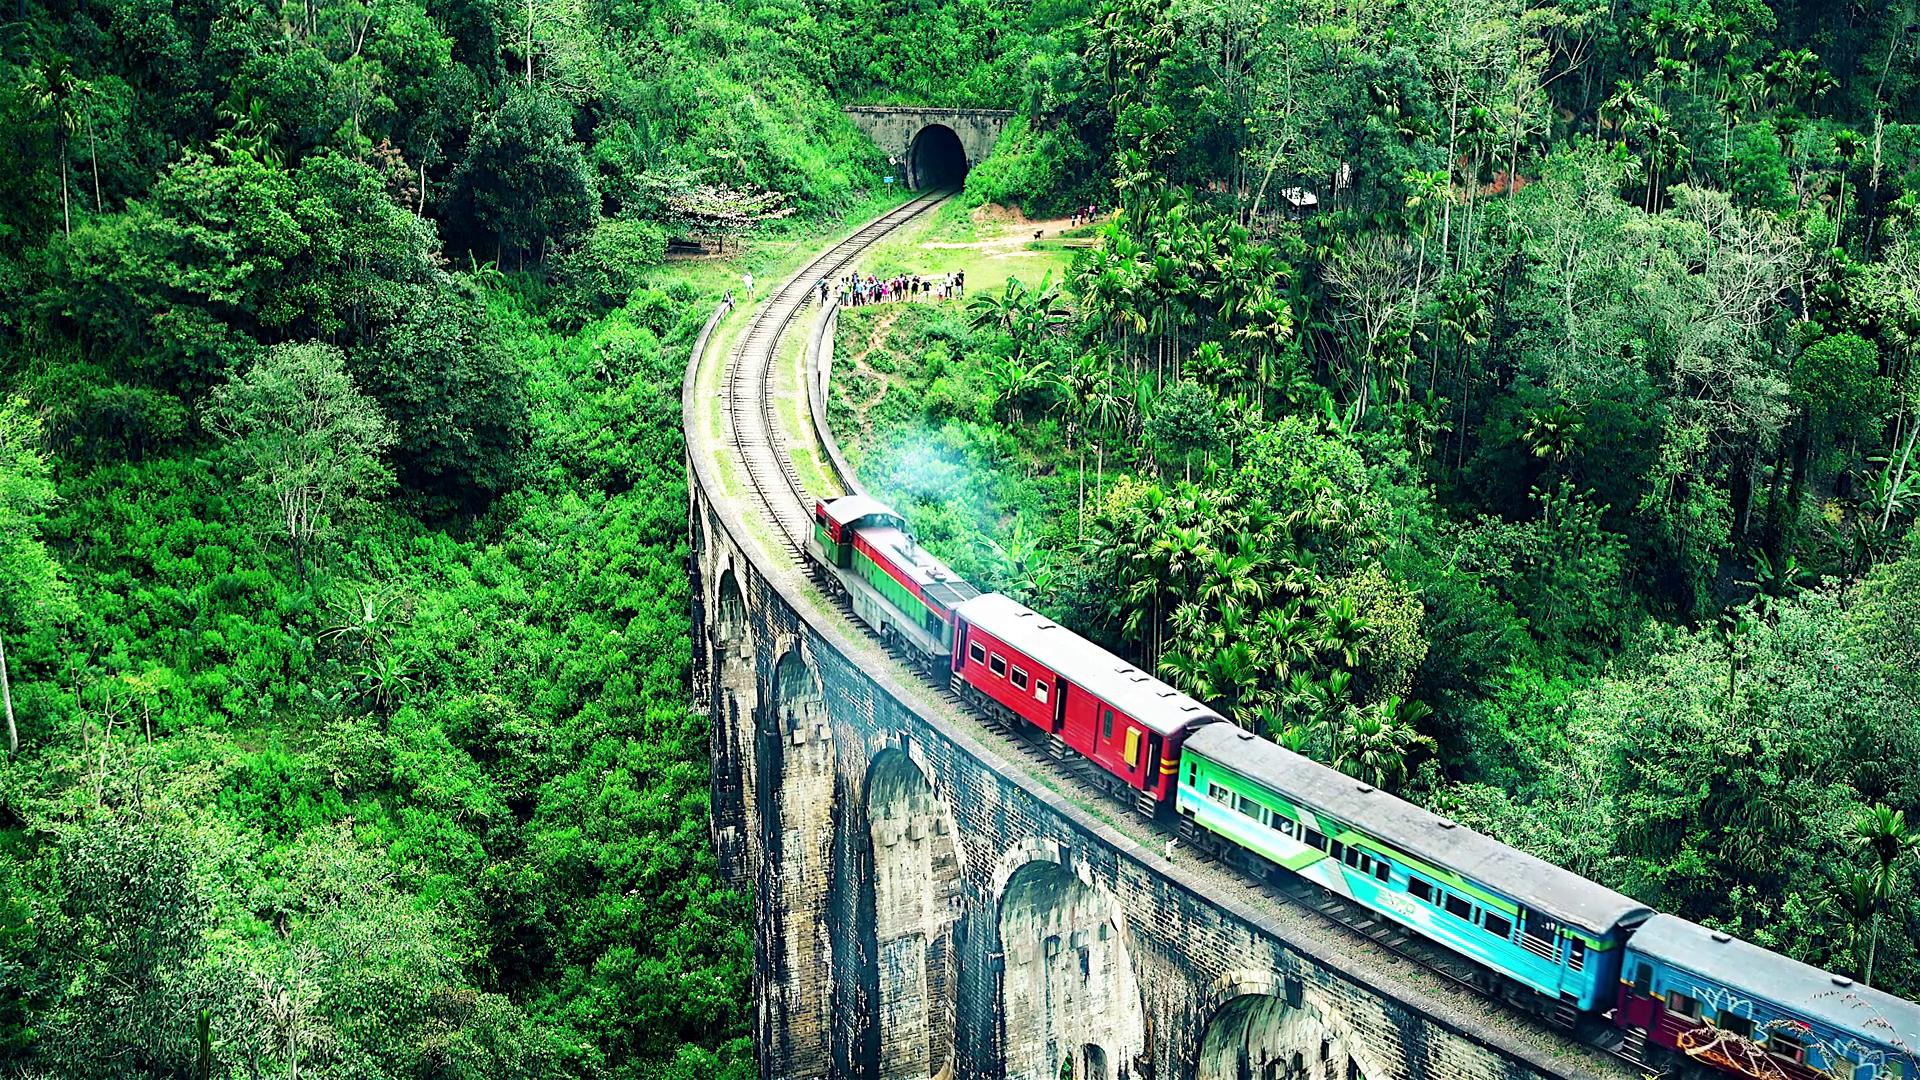 Crossing the skies of Sri Lanka